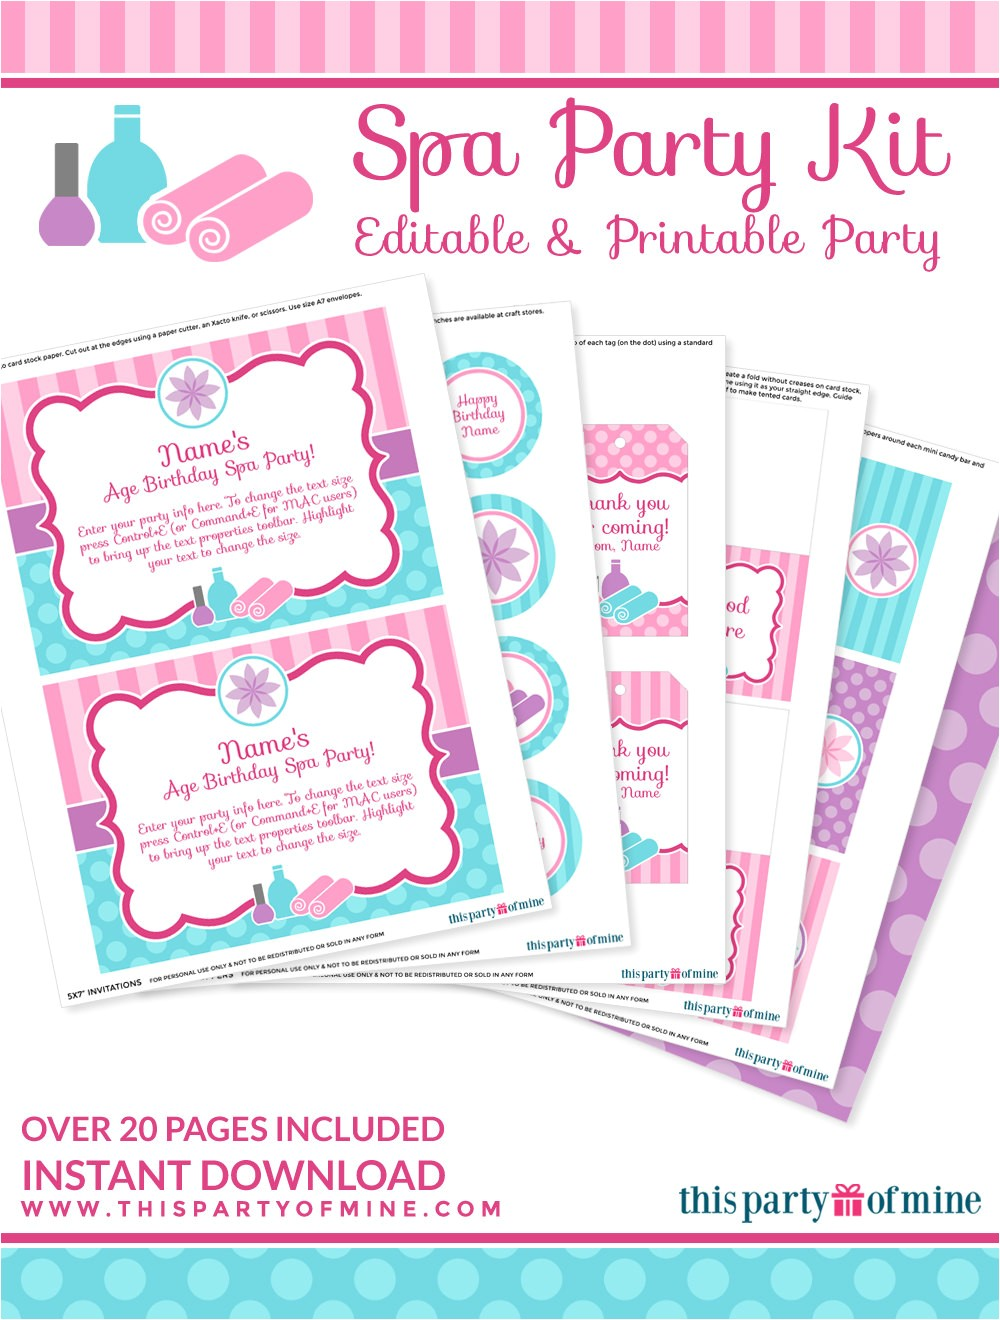 Printable Birthday Invitation Kits Spa Party Invitation Decorations Kit Printable Birthday